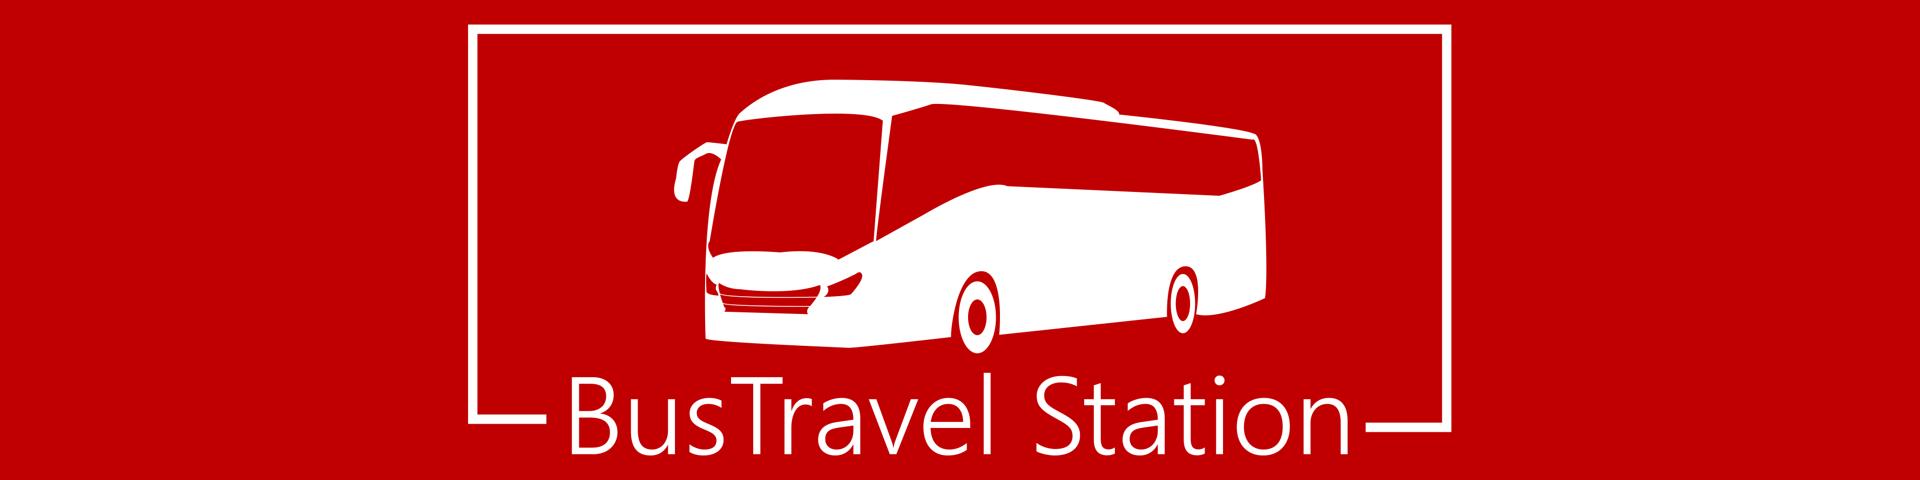 BusTravel Station